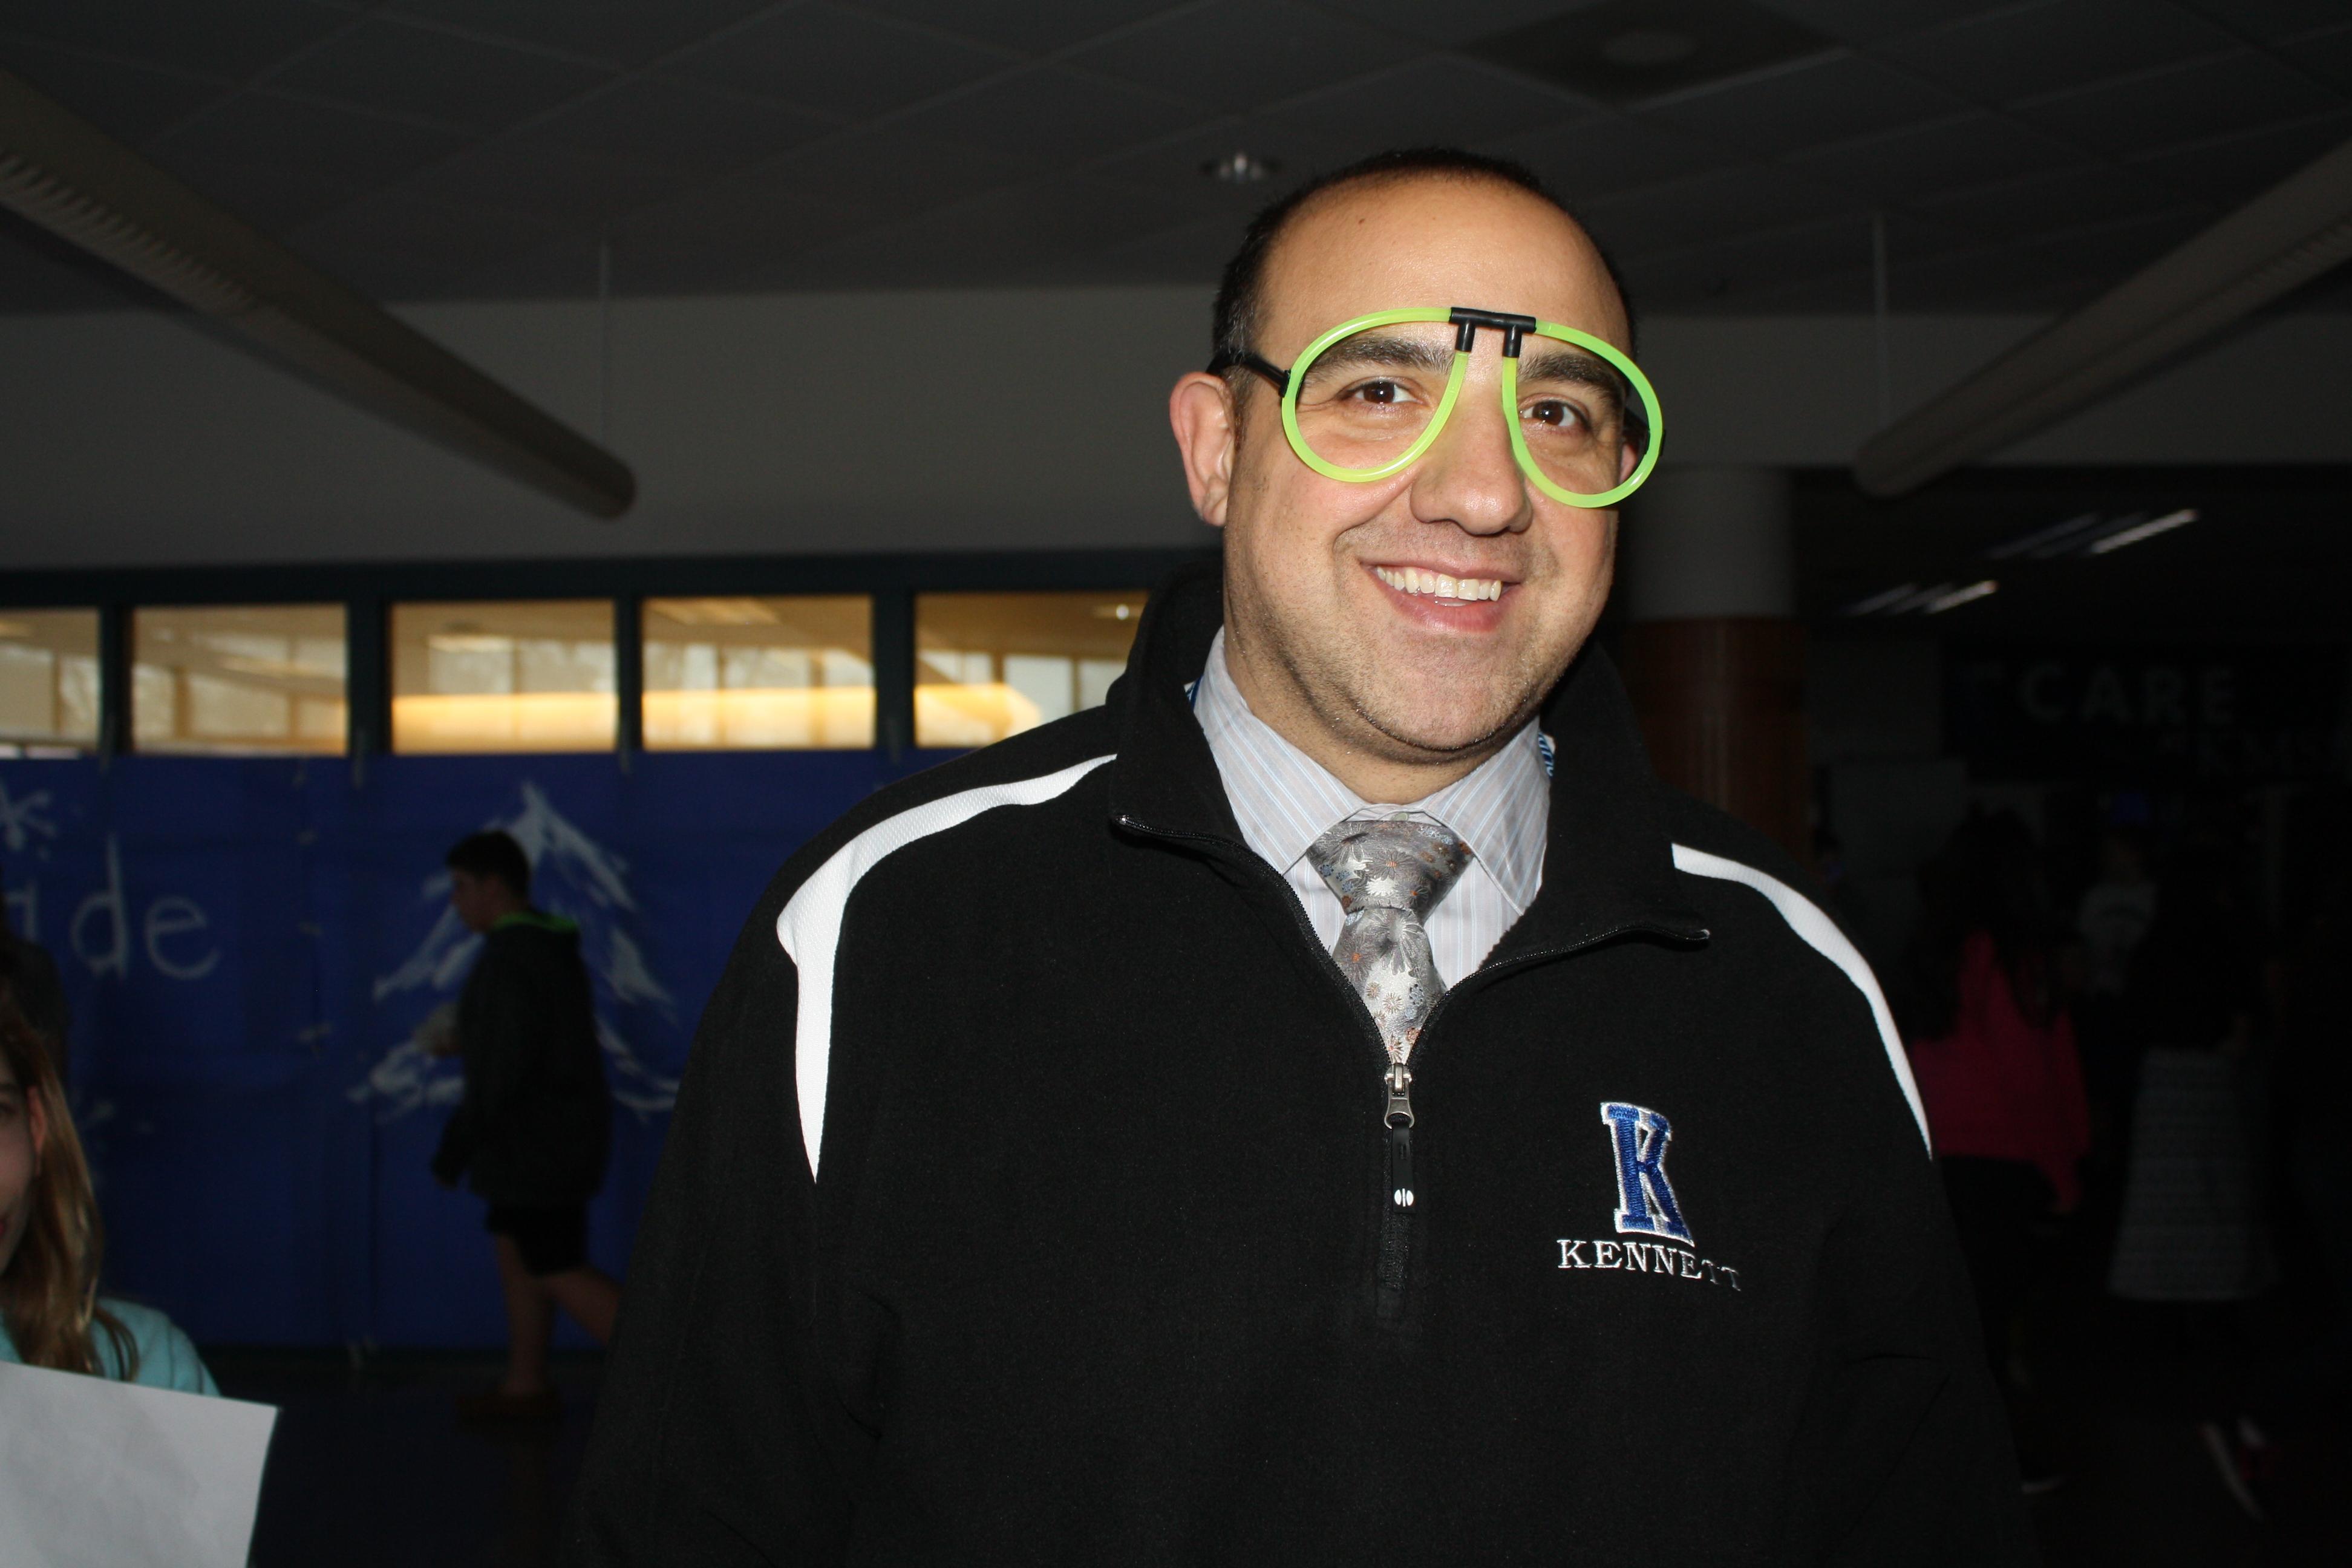 principal wearing fake glasses